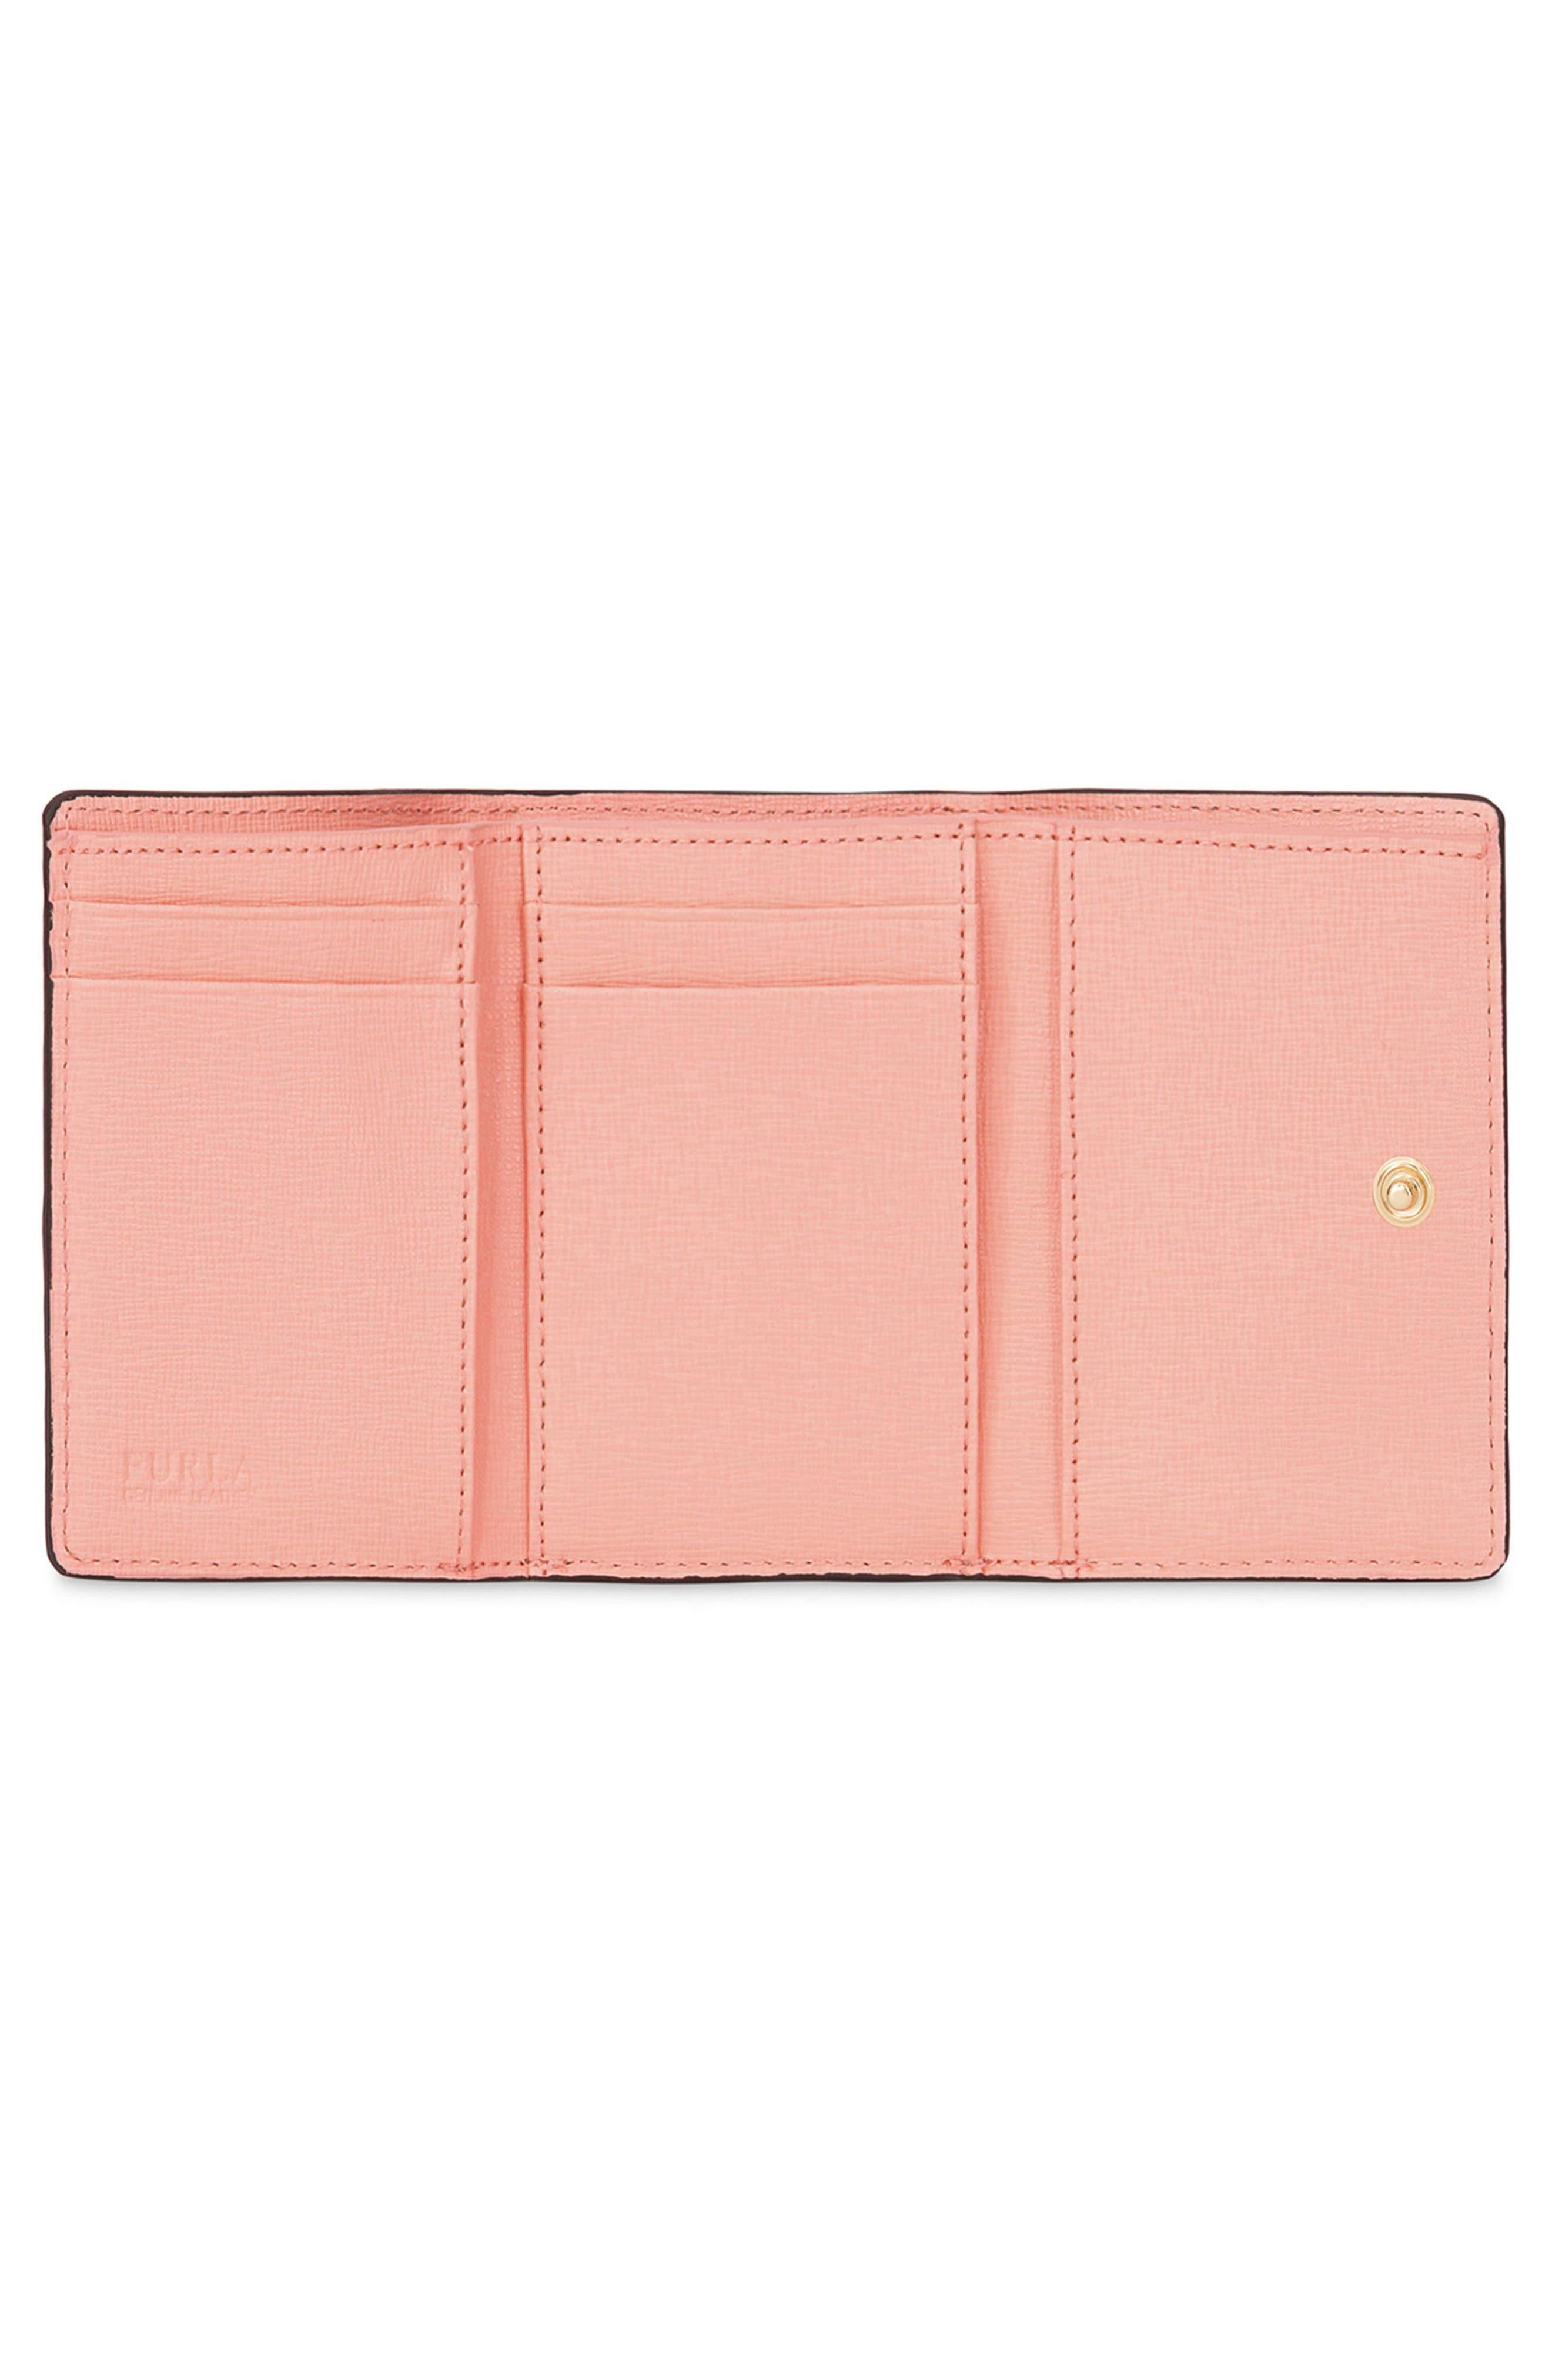 Babylon Saffiano Leather Trifold Wallet,                             Alternate thumbnail 6, color,